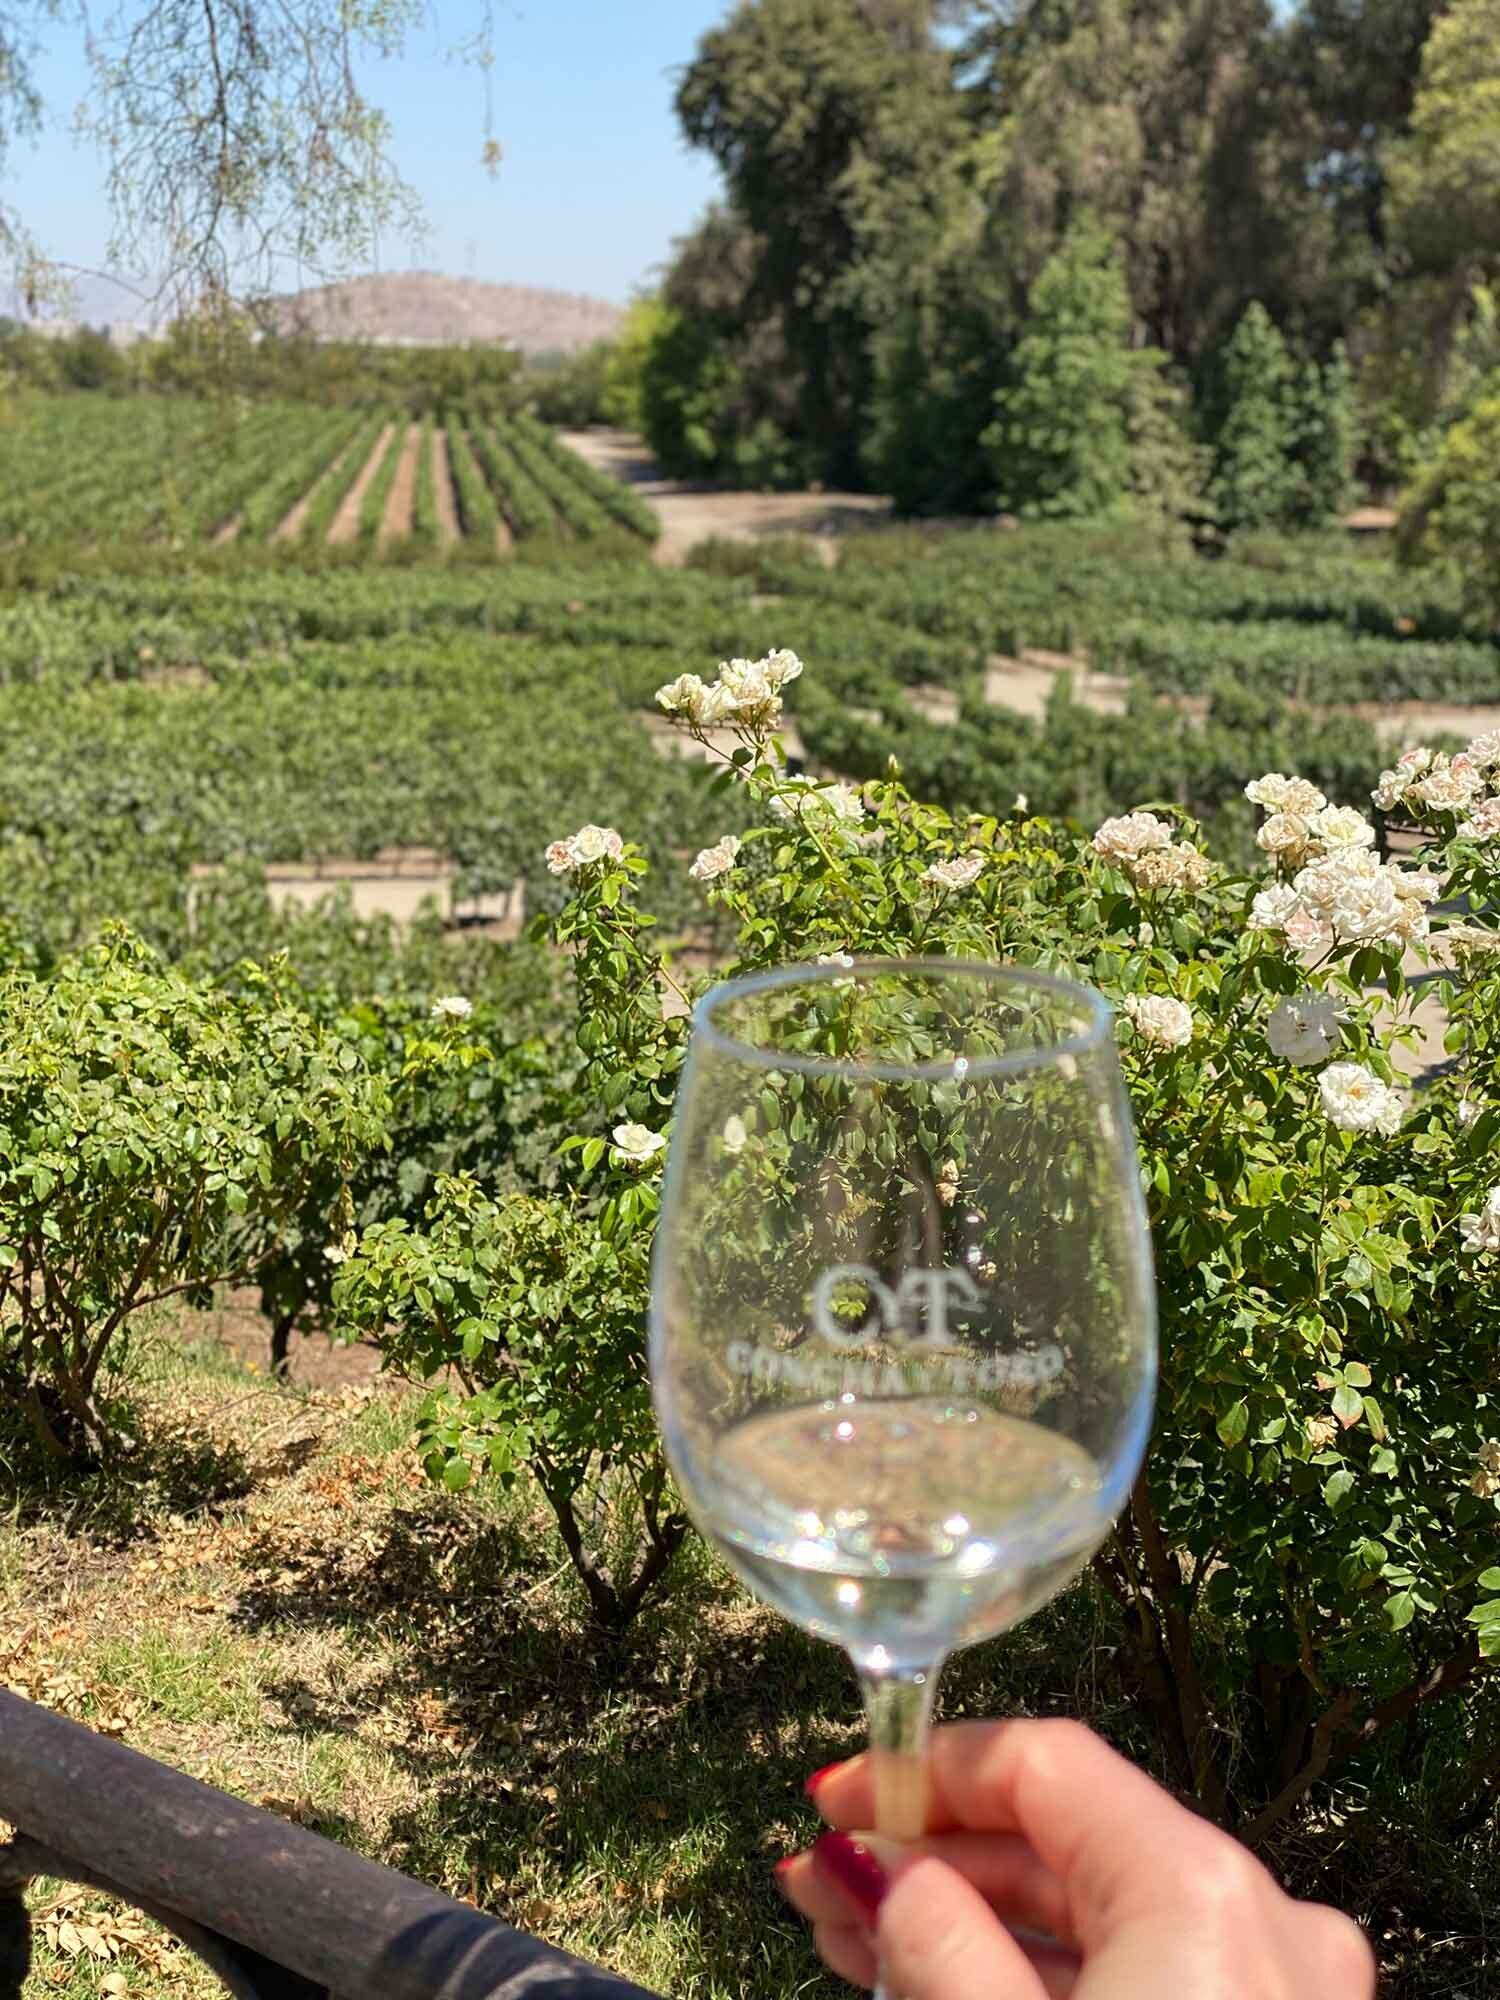 Wine tasting at Conca Y Toro, Chile